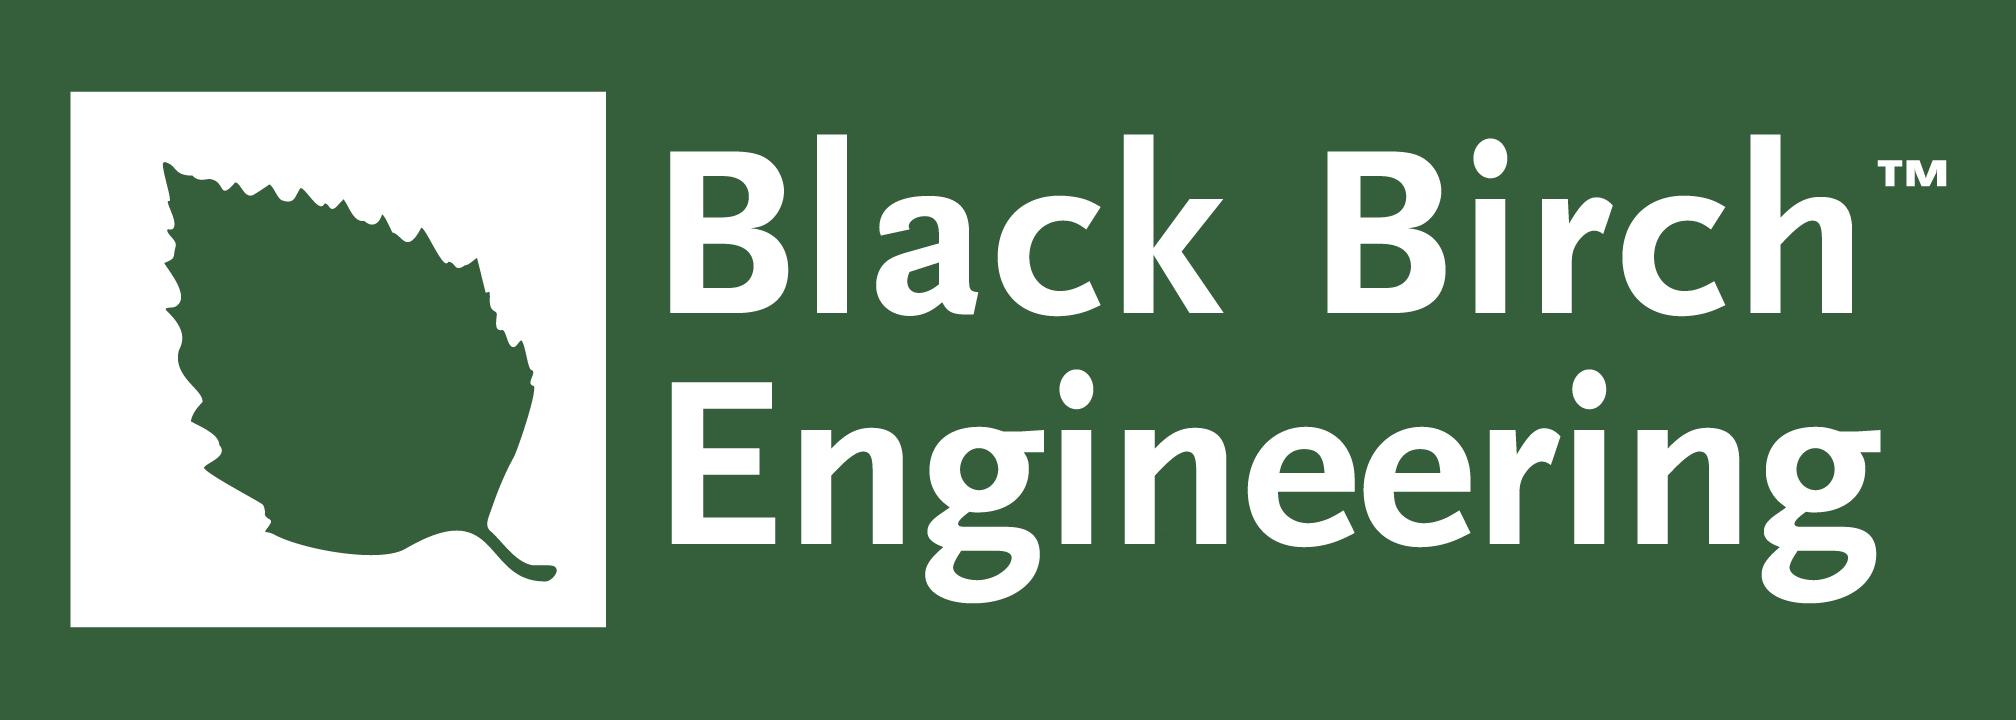 Black Birch Engineering